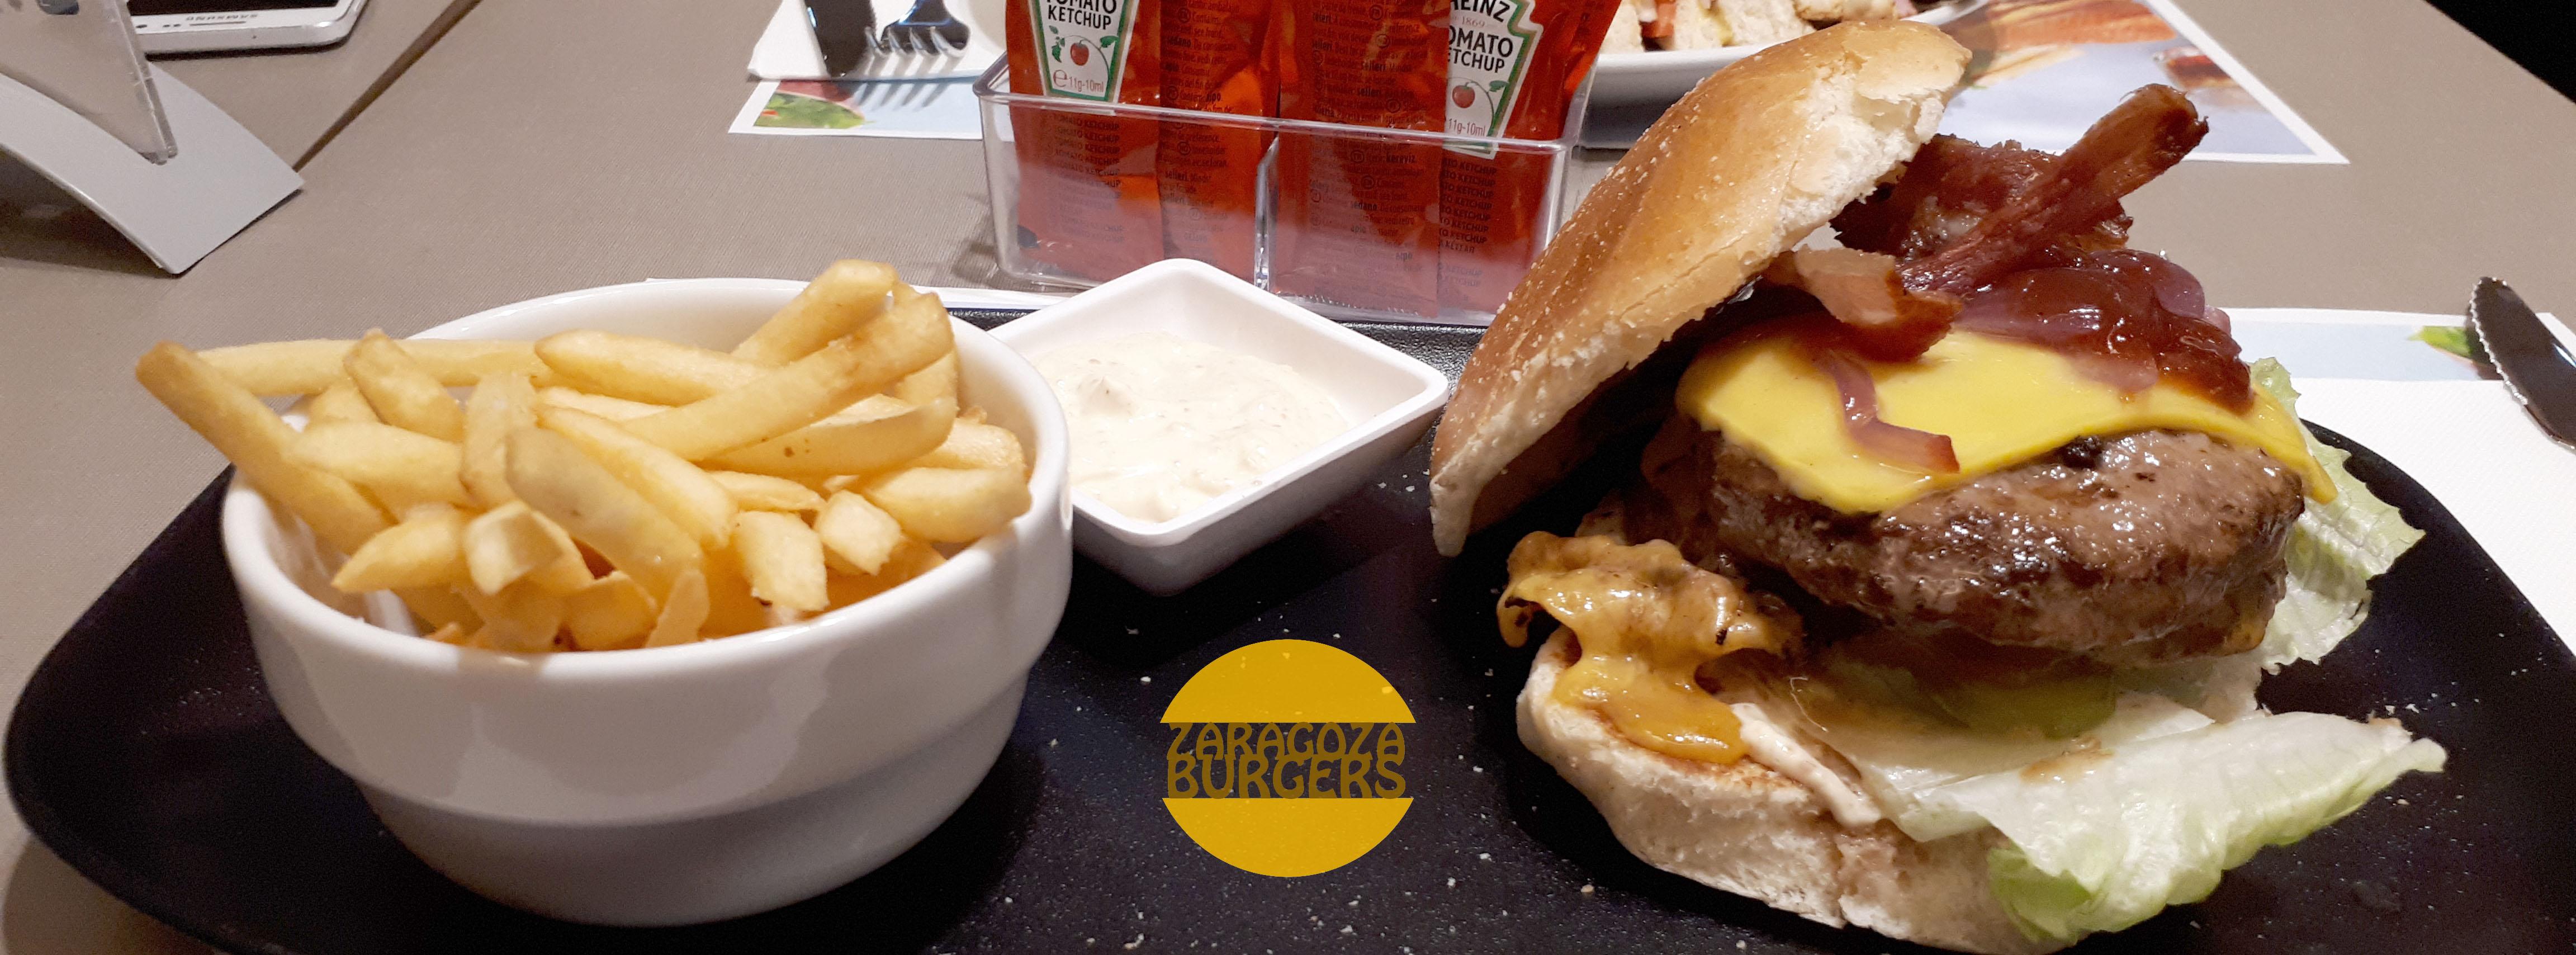 hamburguesa Vips Burger